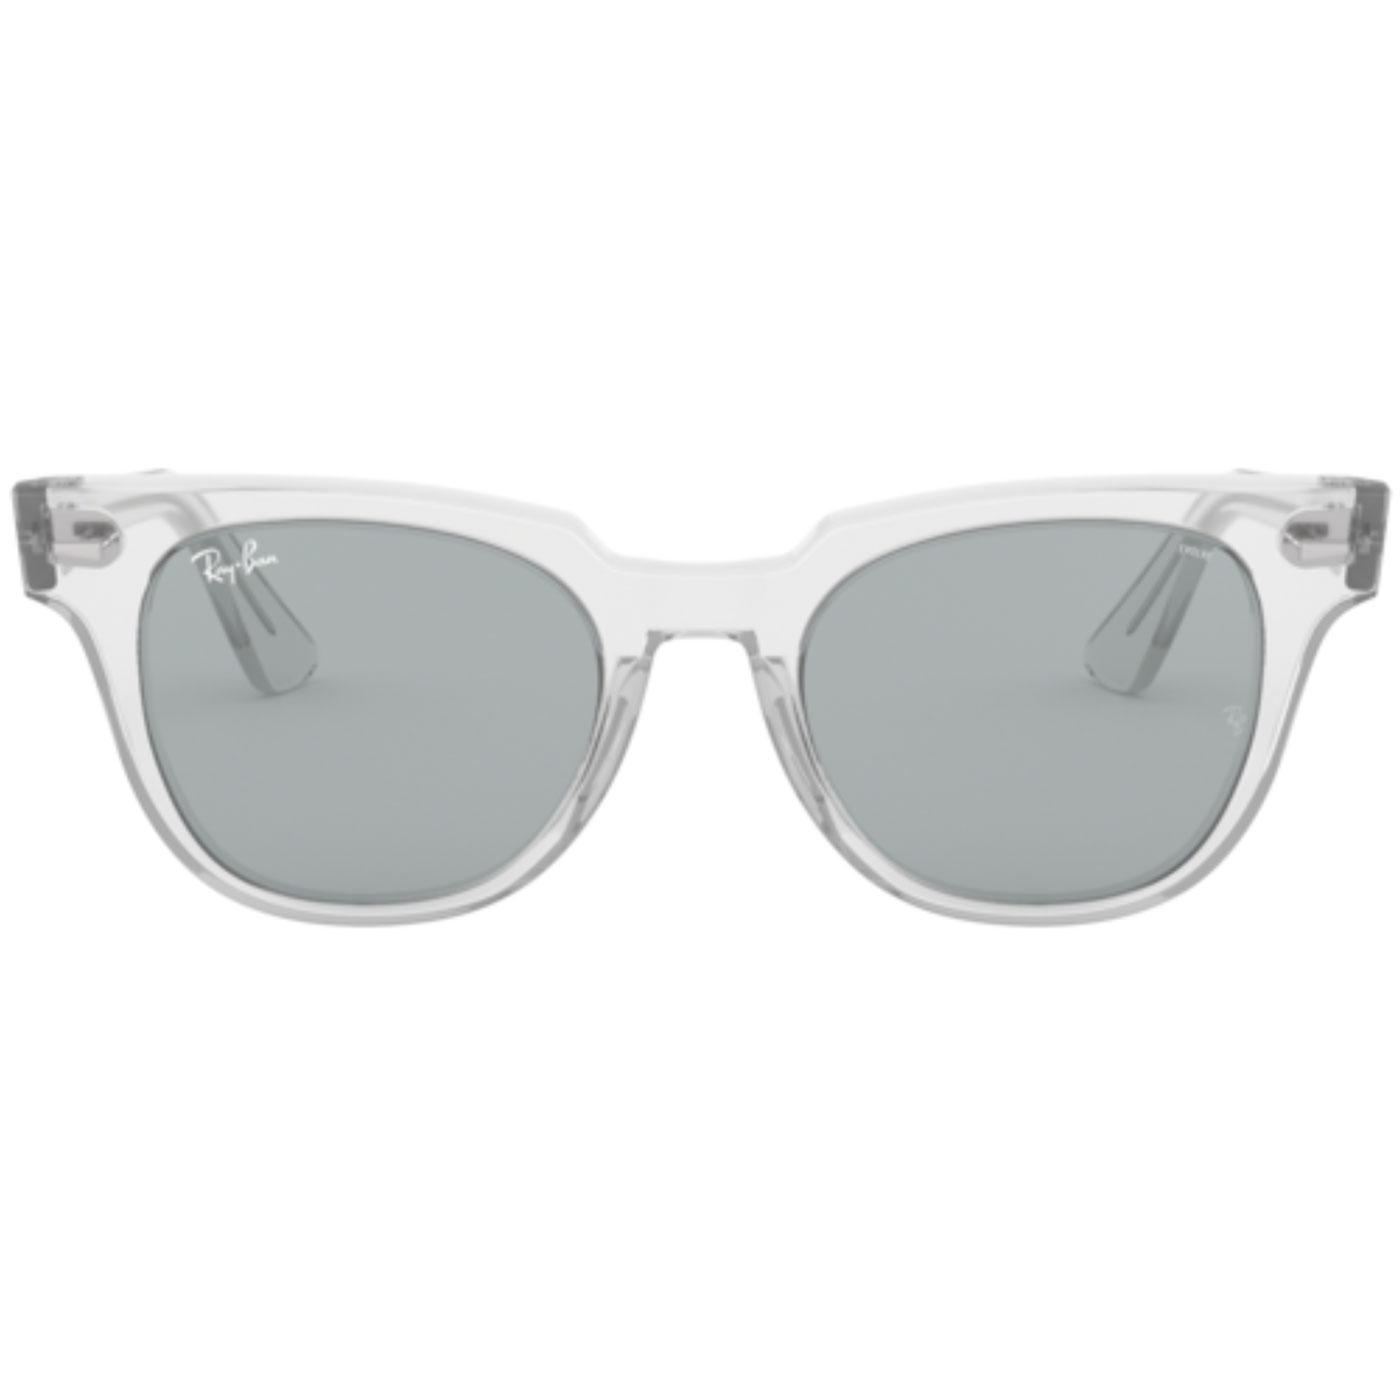 Meteor RAY-BAN Retro Wayfarer Evolve Sunglasses TB